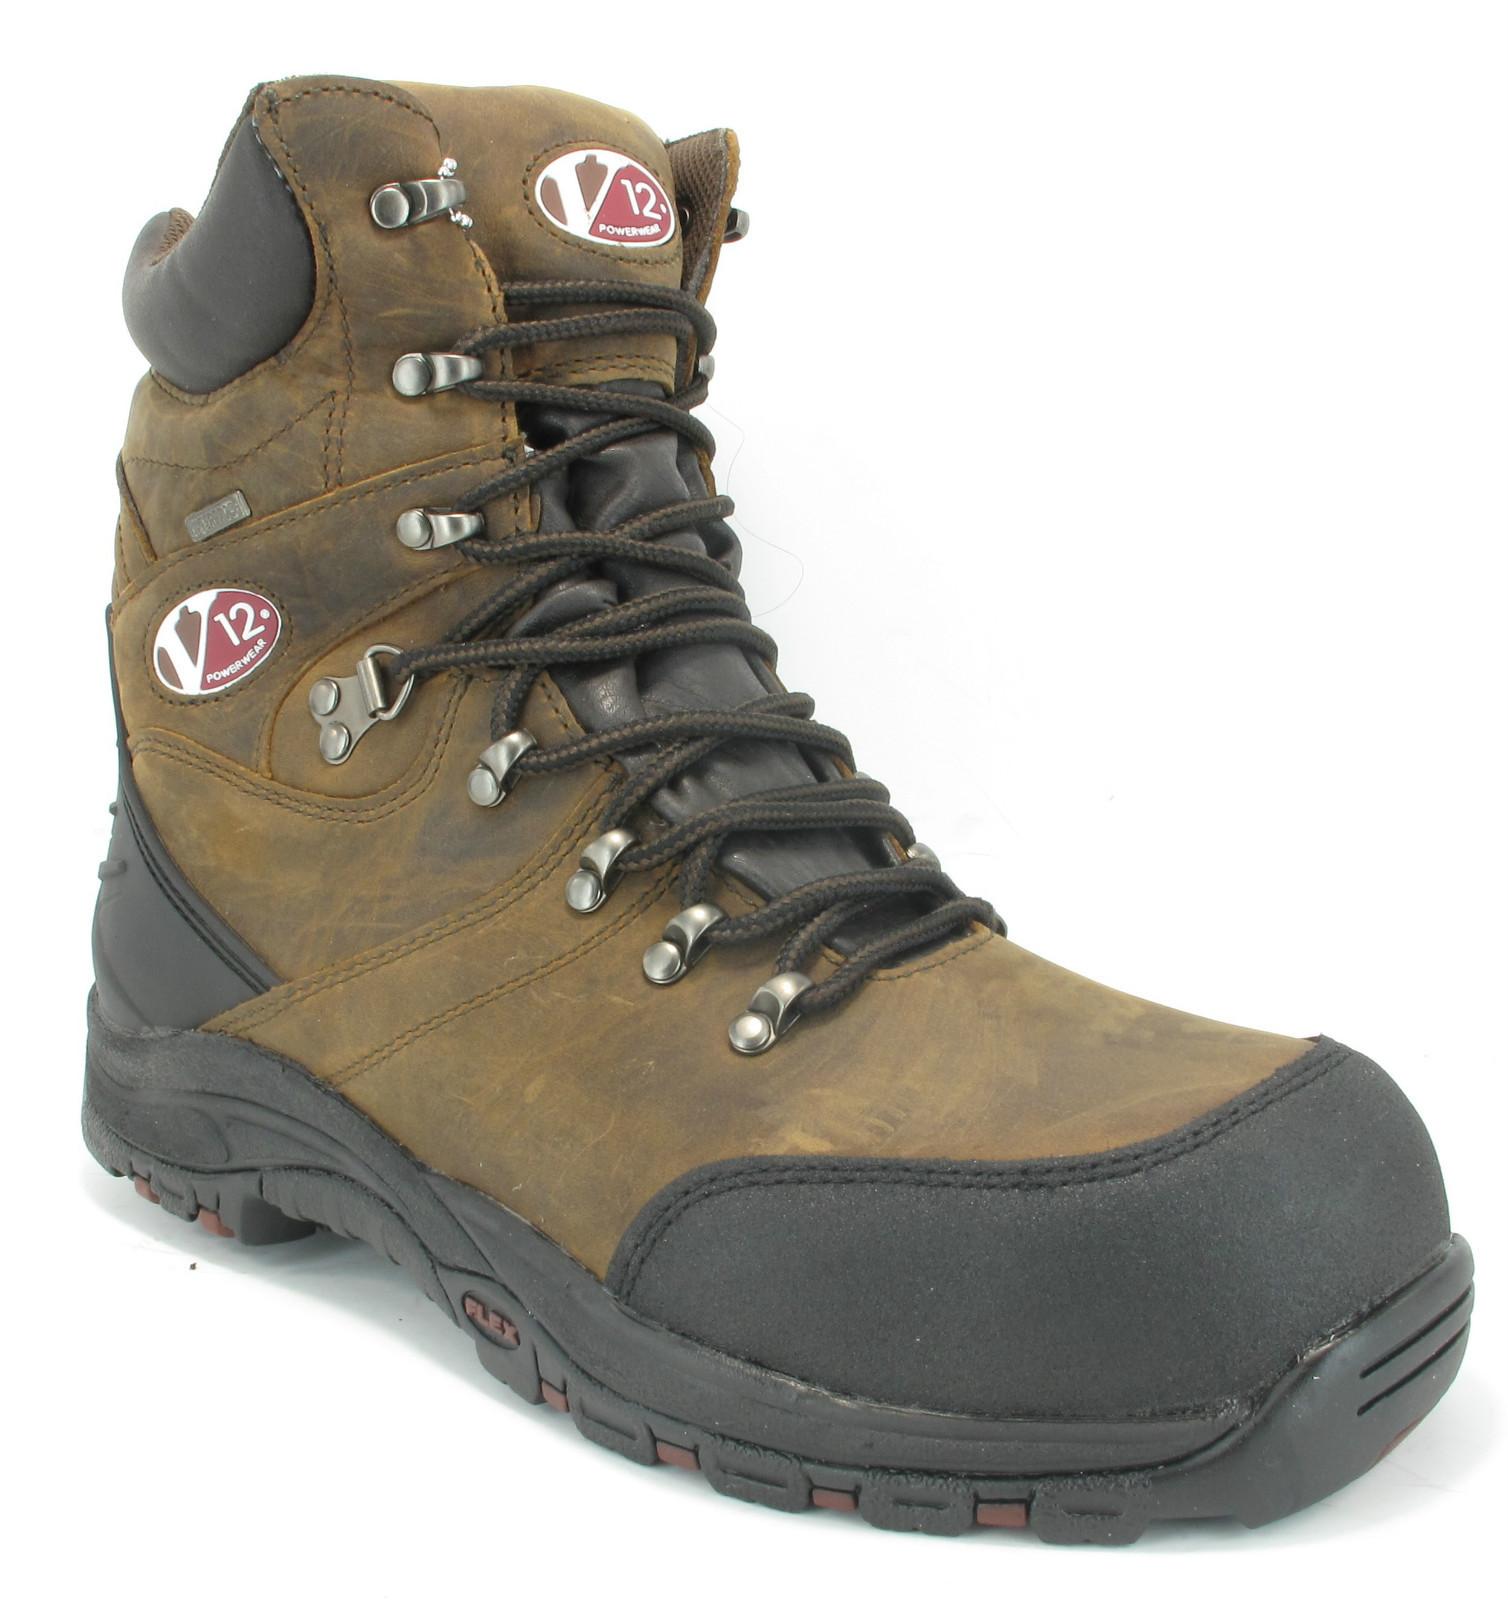 mens v12 high leg style waterproof s3 steel toe